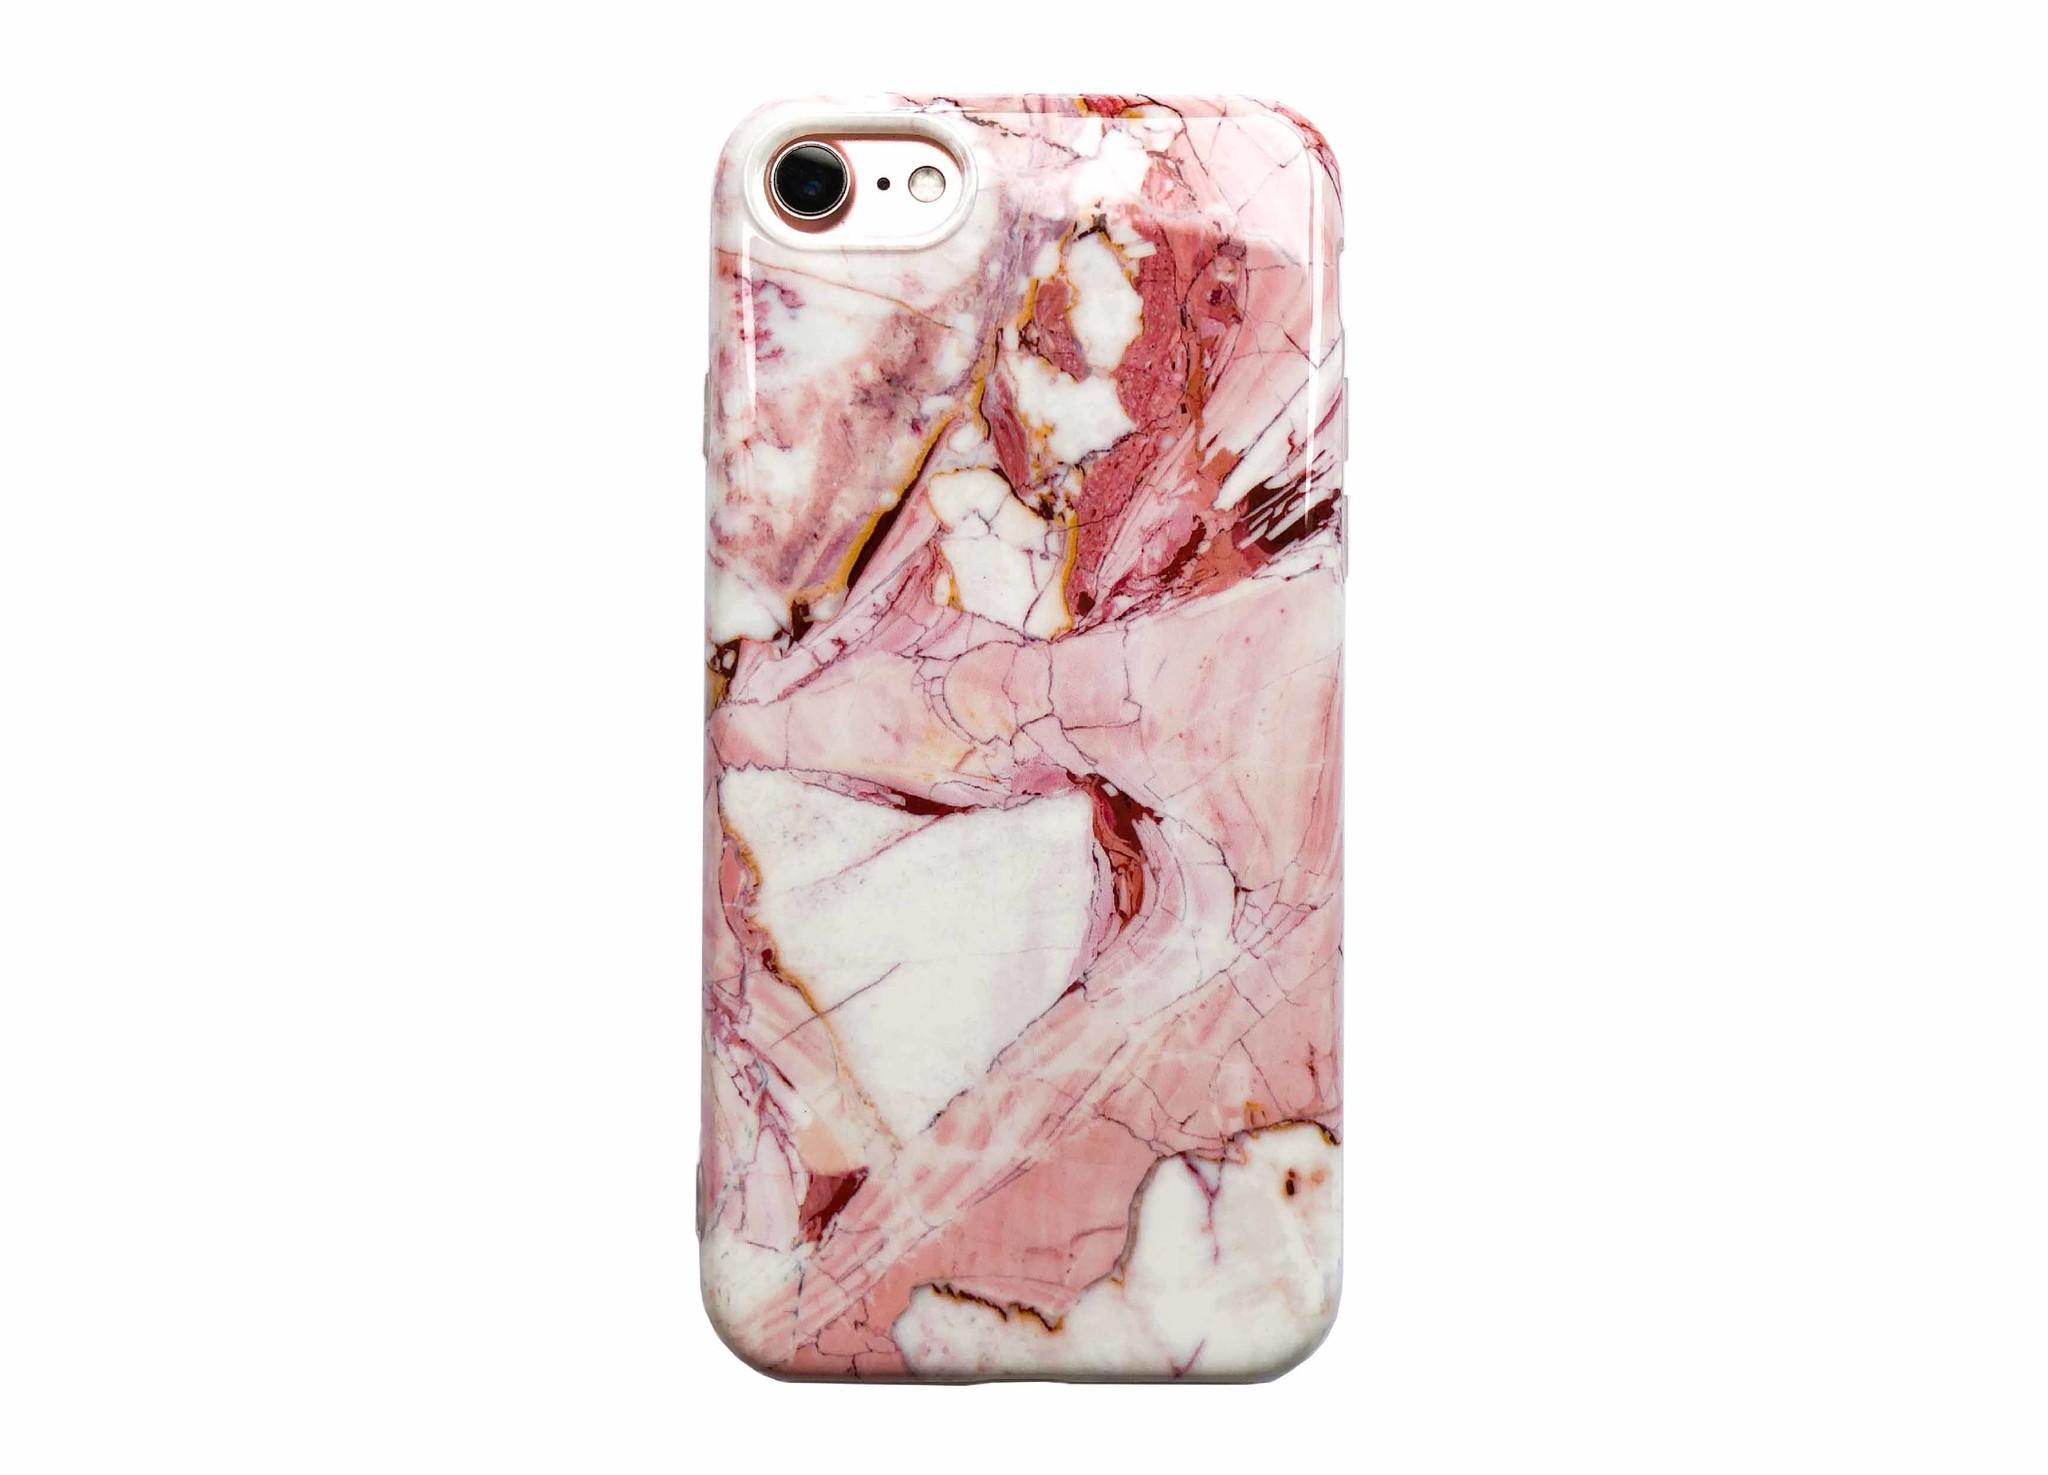 Smartphonehoesje iPhone 7 / 8 Plus | Marmerlook wit/roze